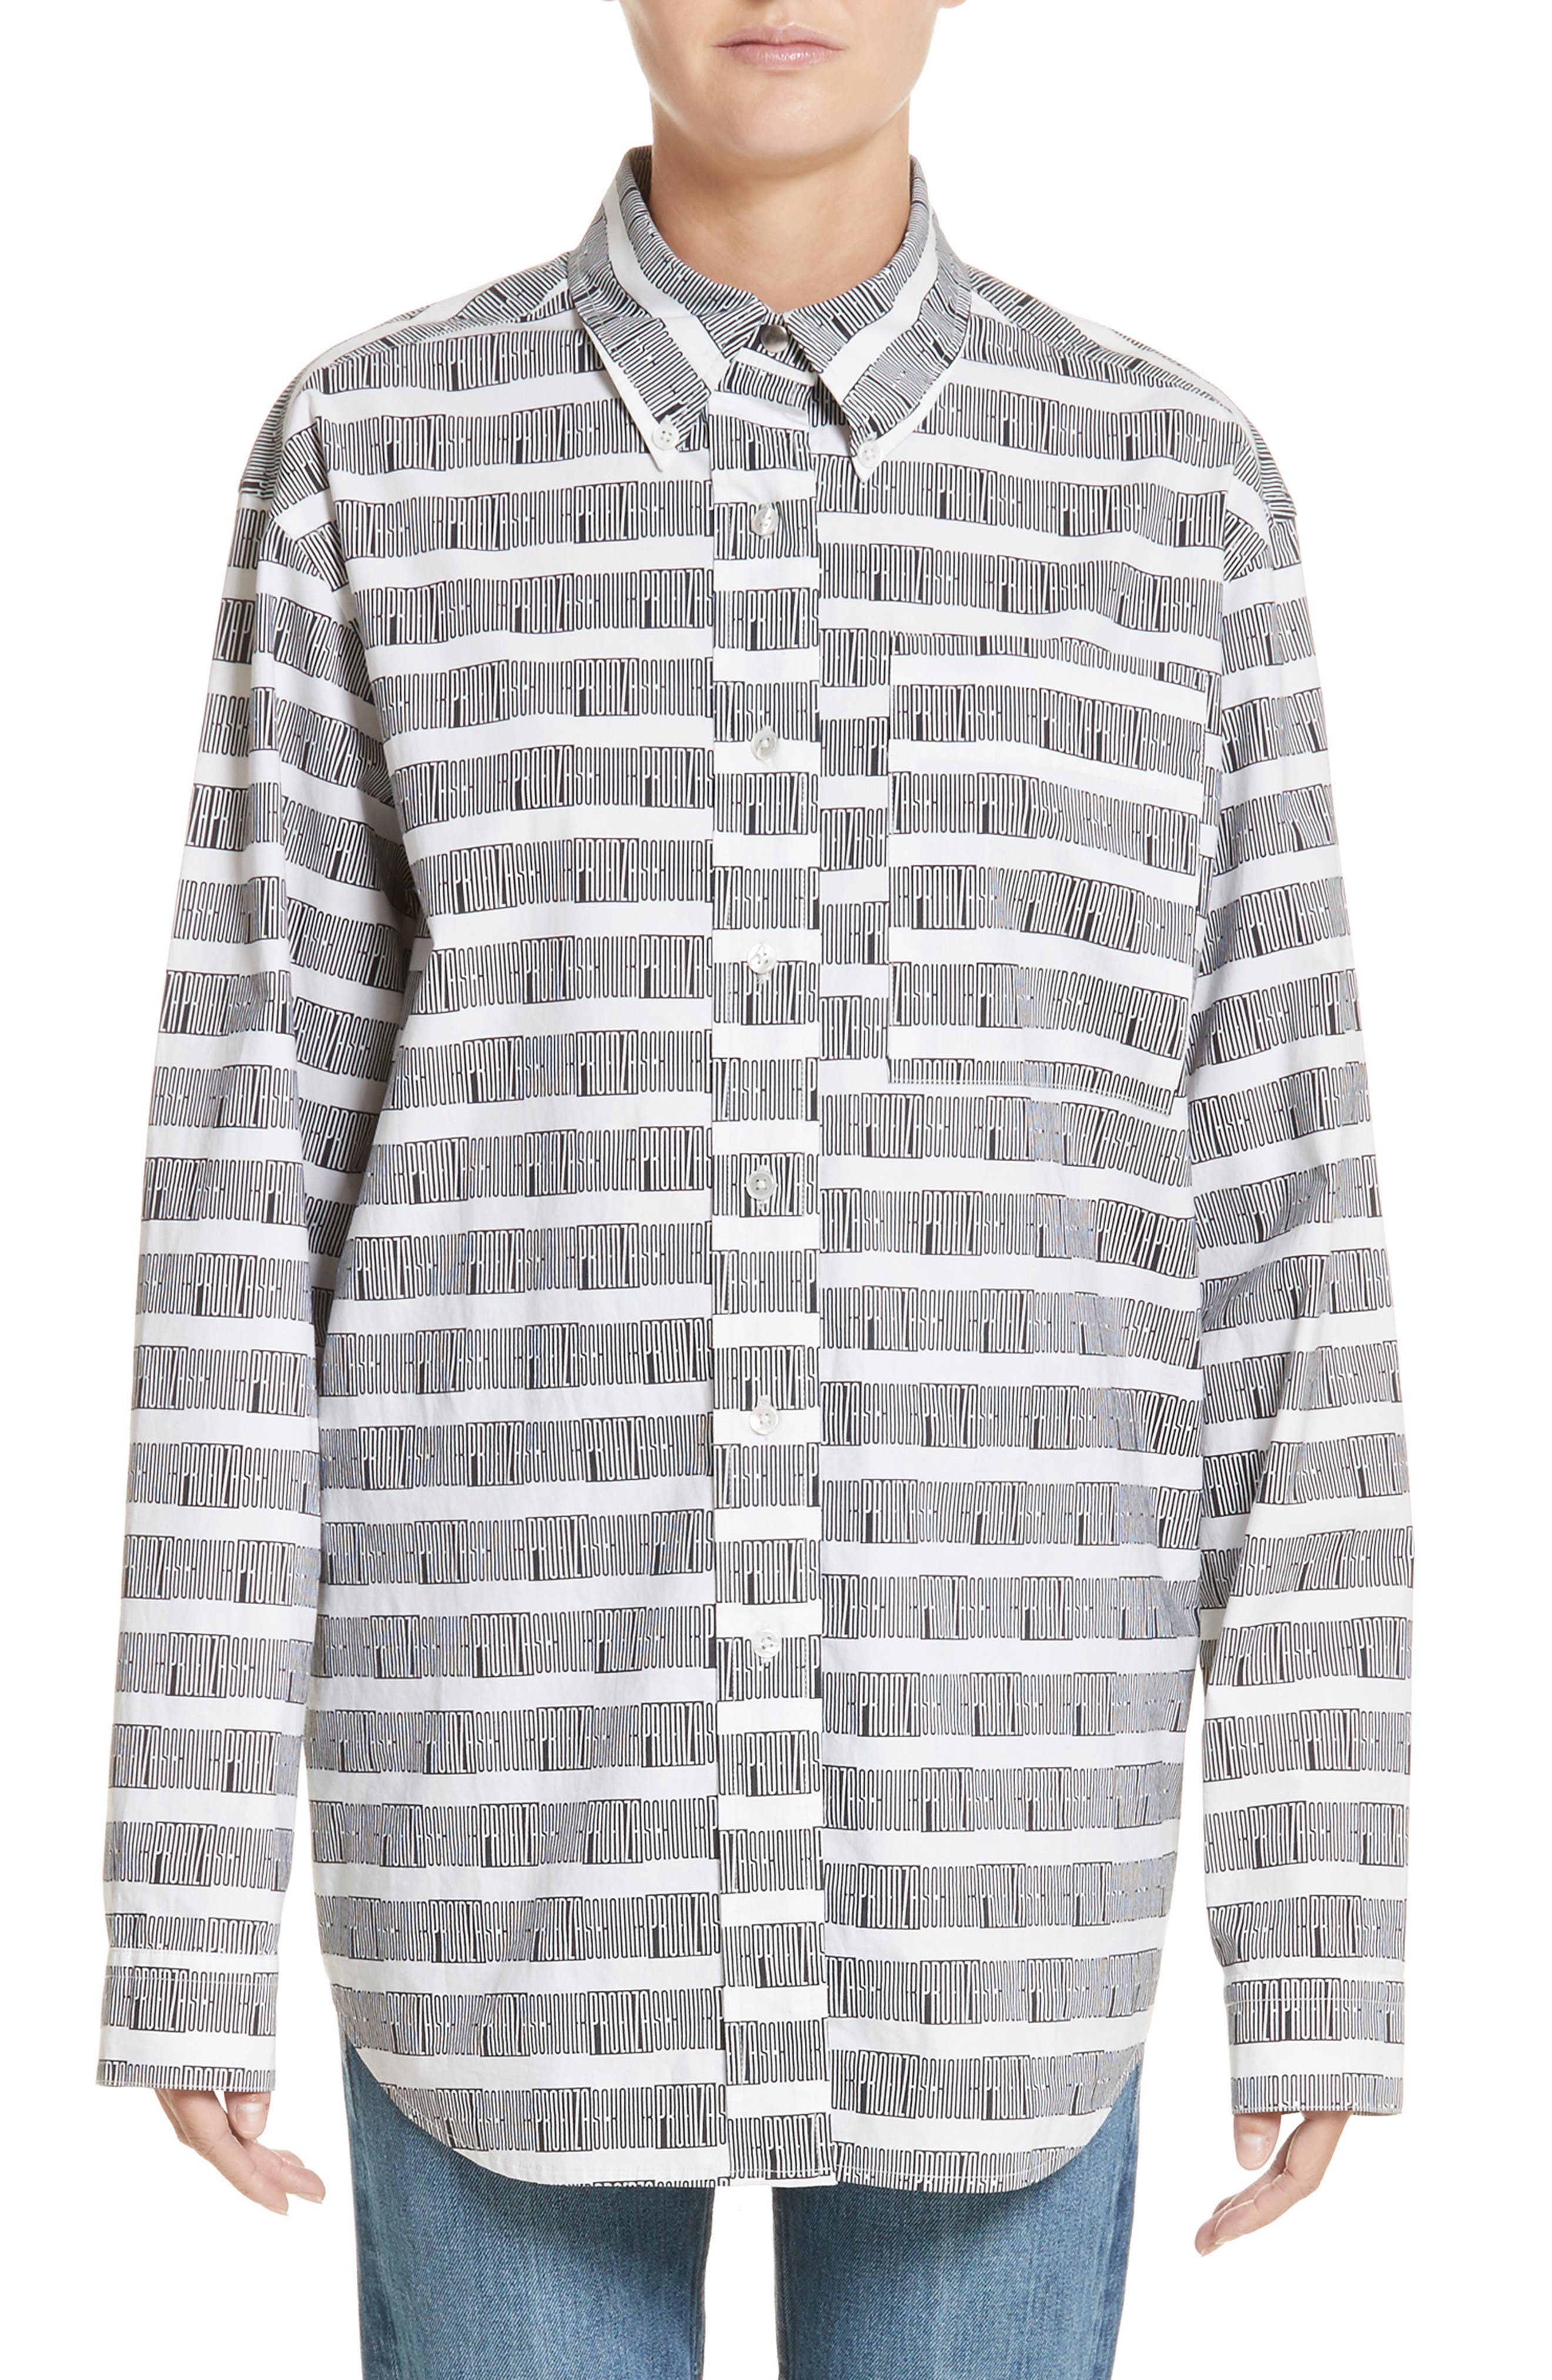 PSWL Graphic Stripe Cotton Top,                             Main thumbnail 1, color,                             001